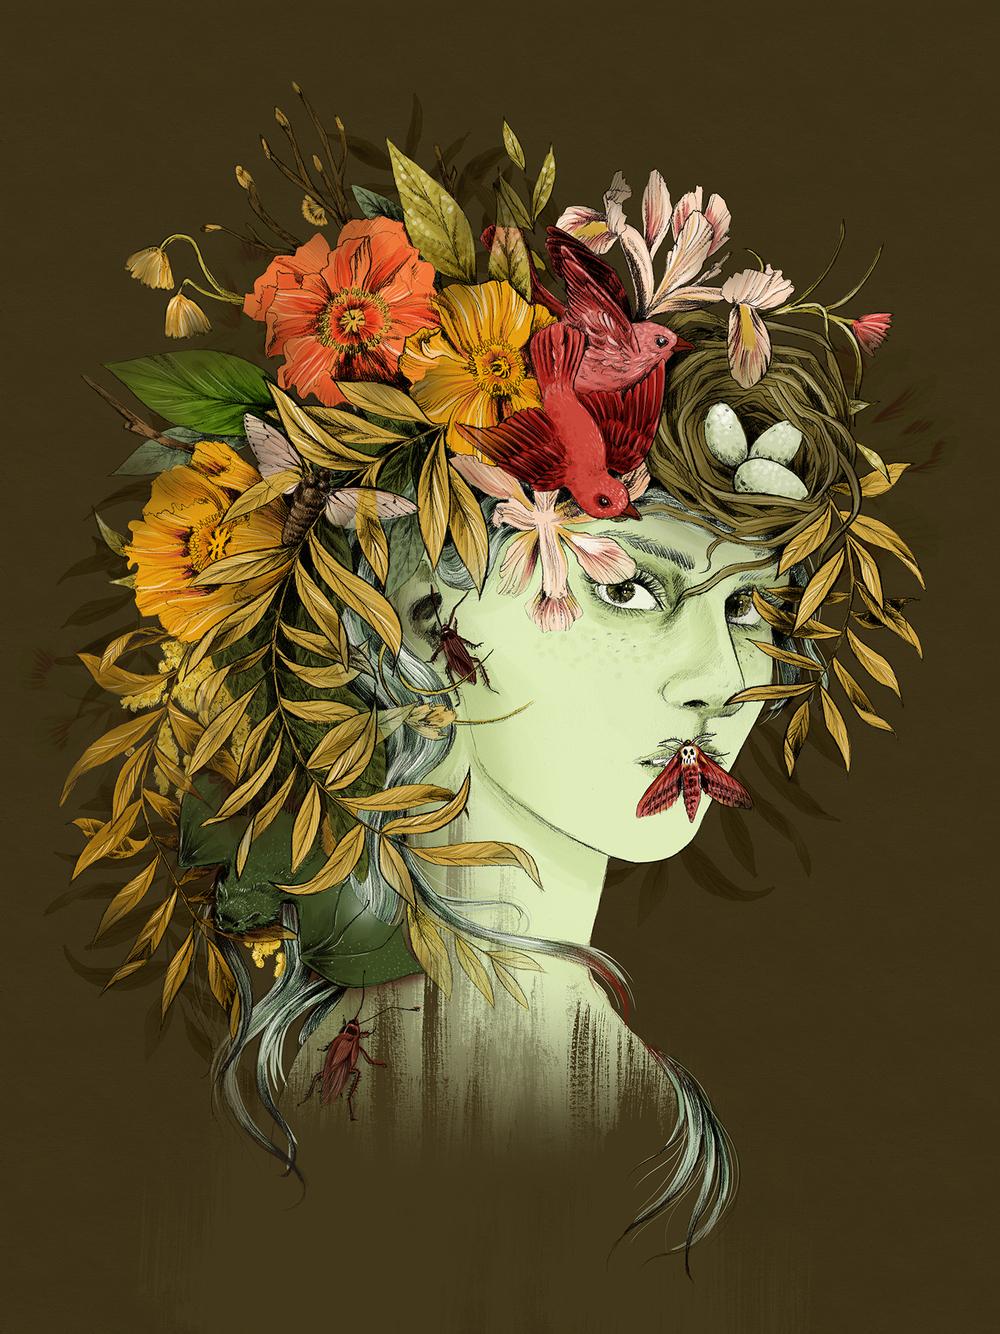 fig. 1.Portrait of Persephone, goddess of spring